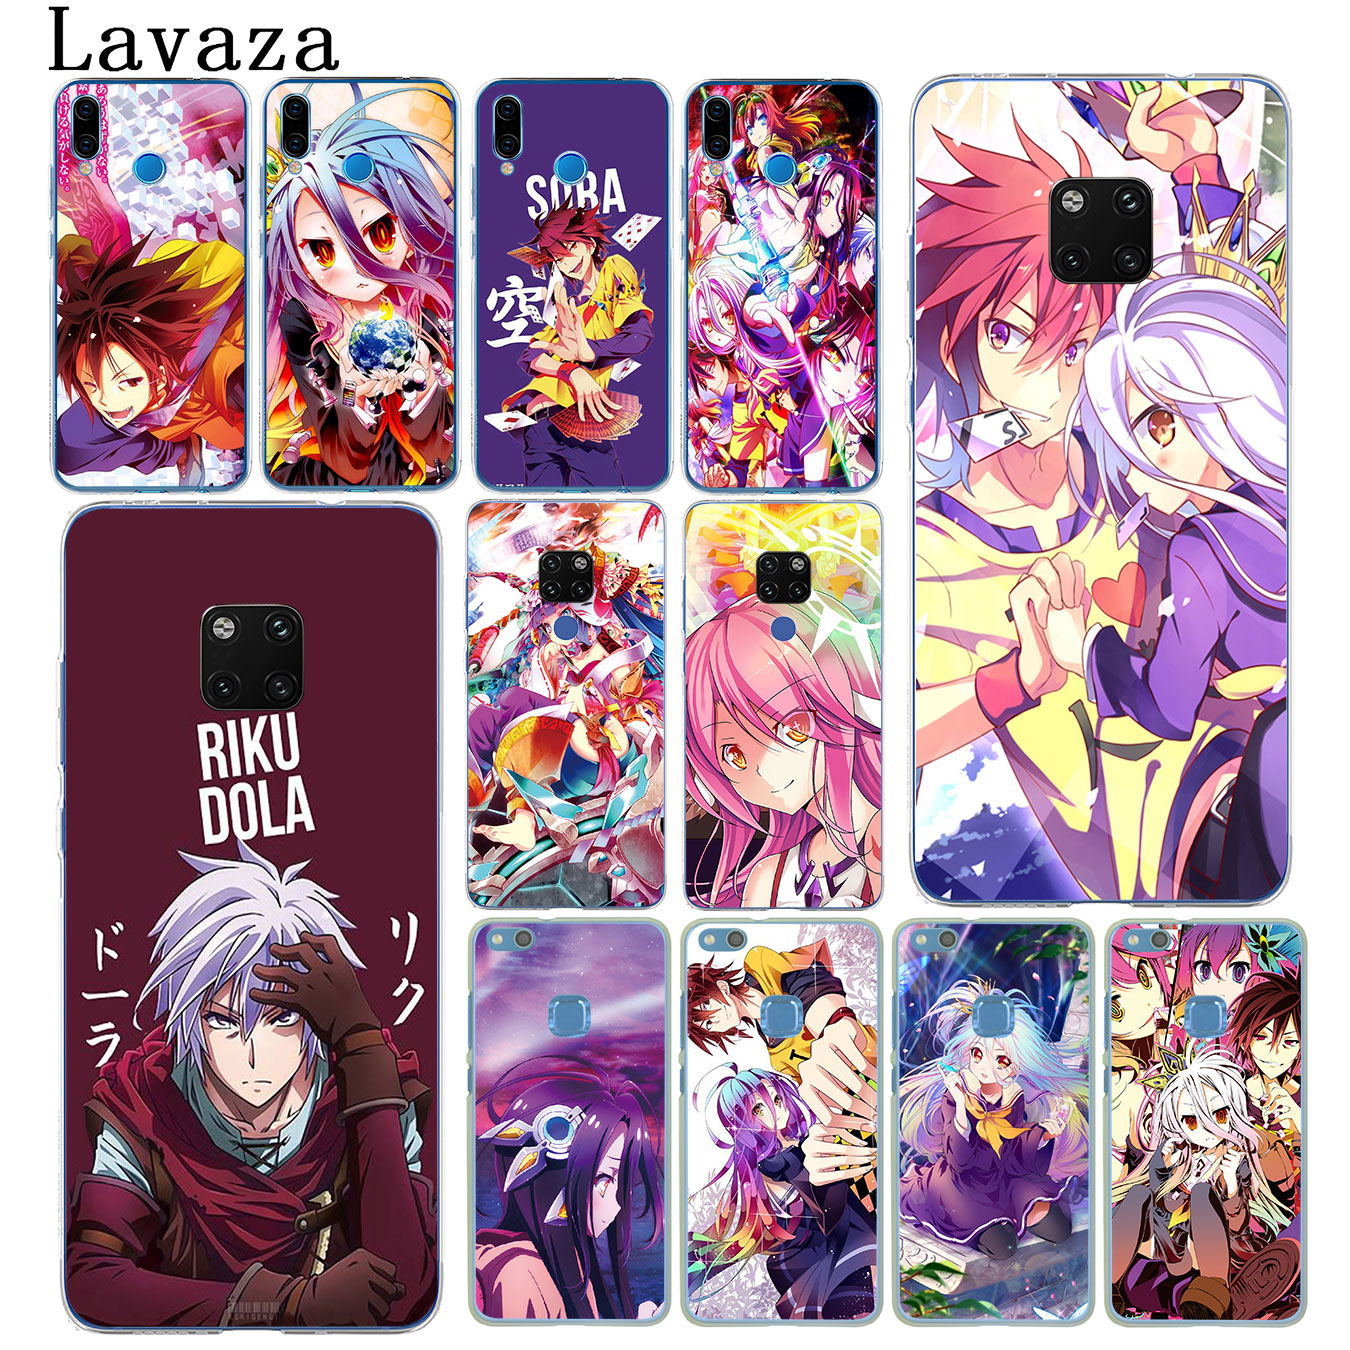 Lavaza vida No juego Anime teléfono caso duro para el Huawei Mate 30 20 Pro 10 Lite Y6 primer Nova 5I 4 3i 3 2i 2 Lite funda